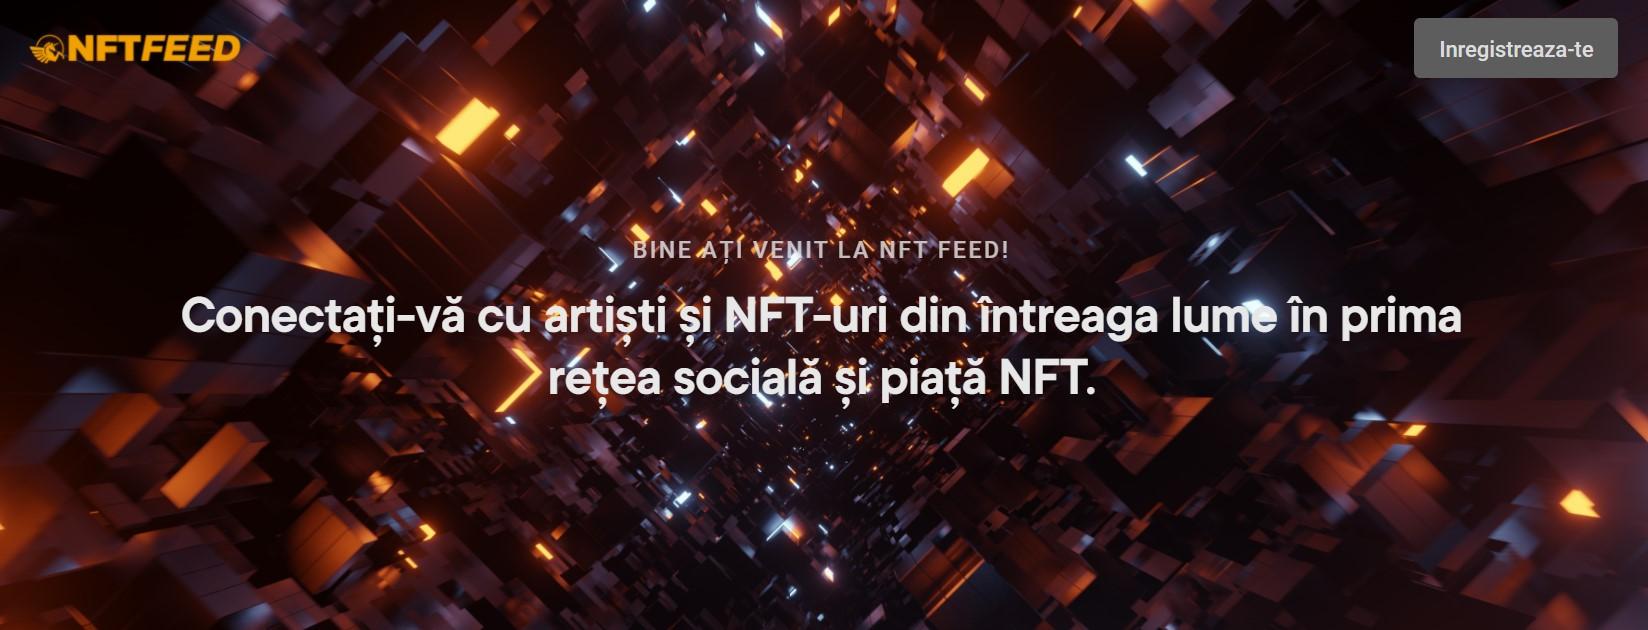 nft feed